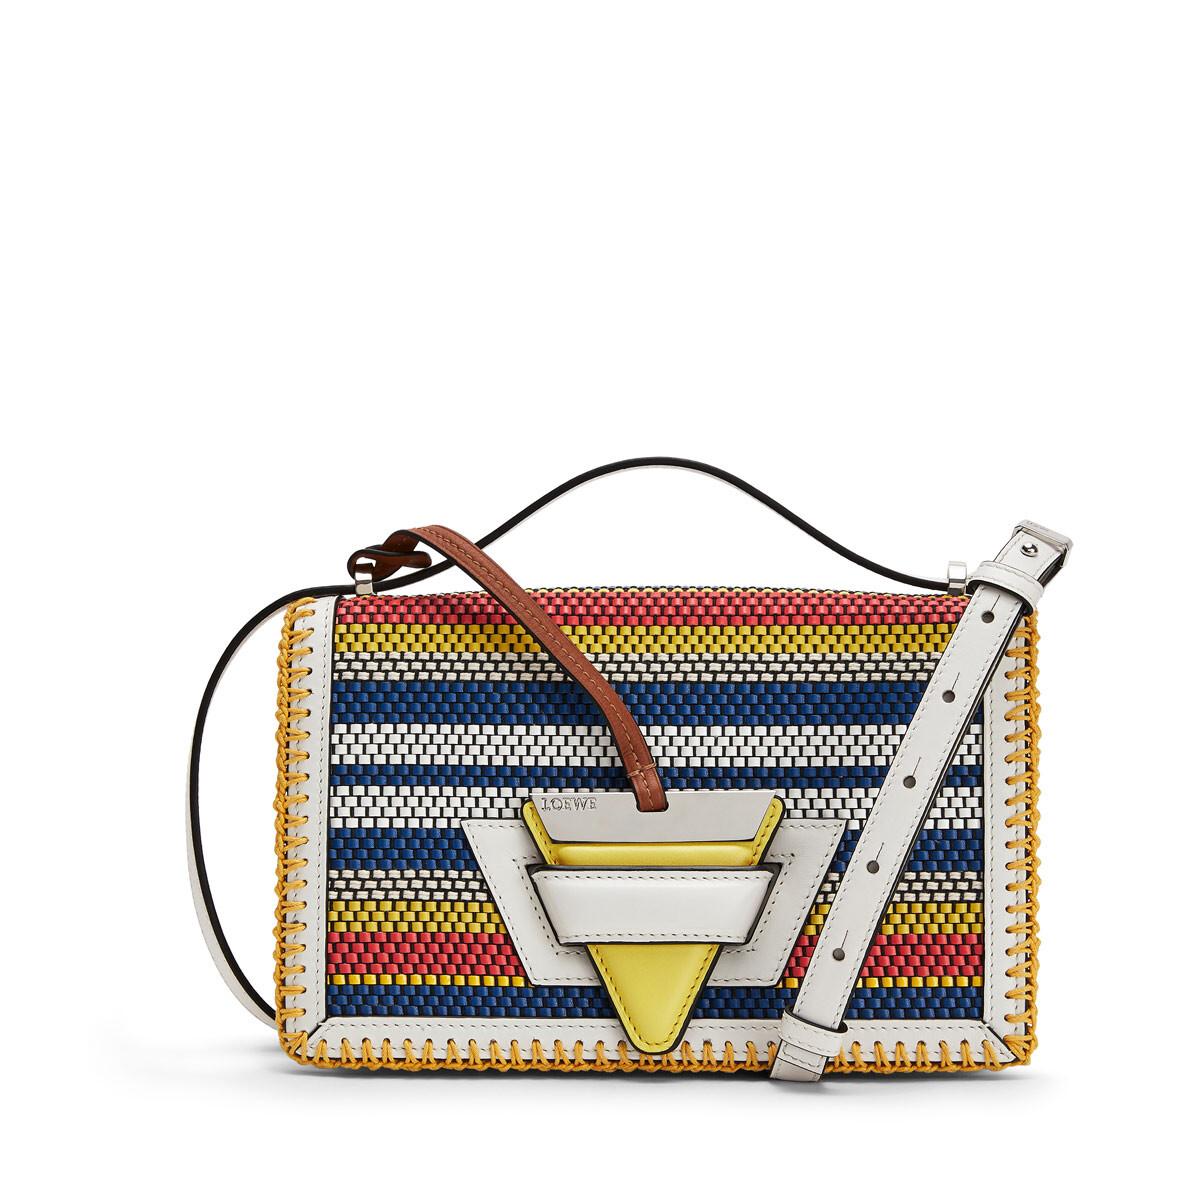 LOEWE Barcelona Woven Stripes Bag Soft White/Multicolour front